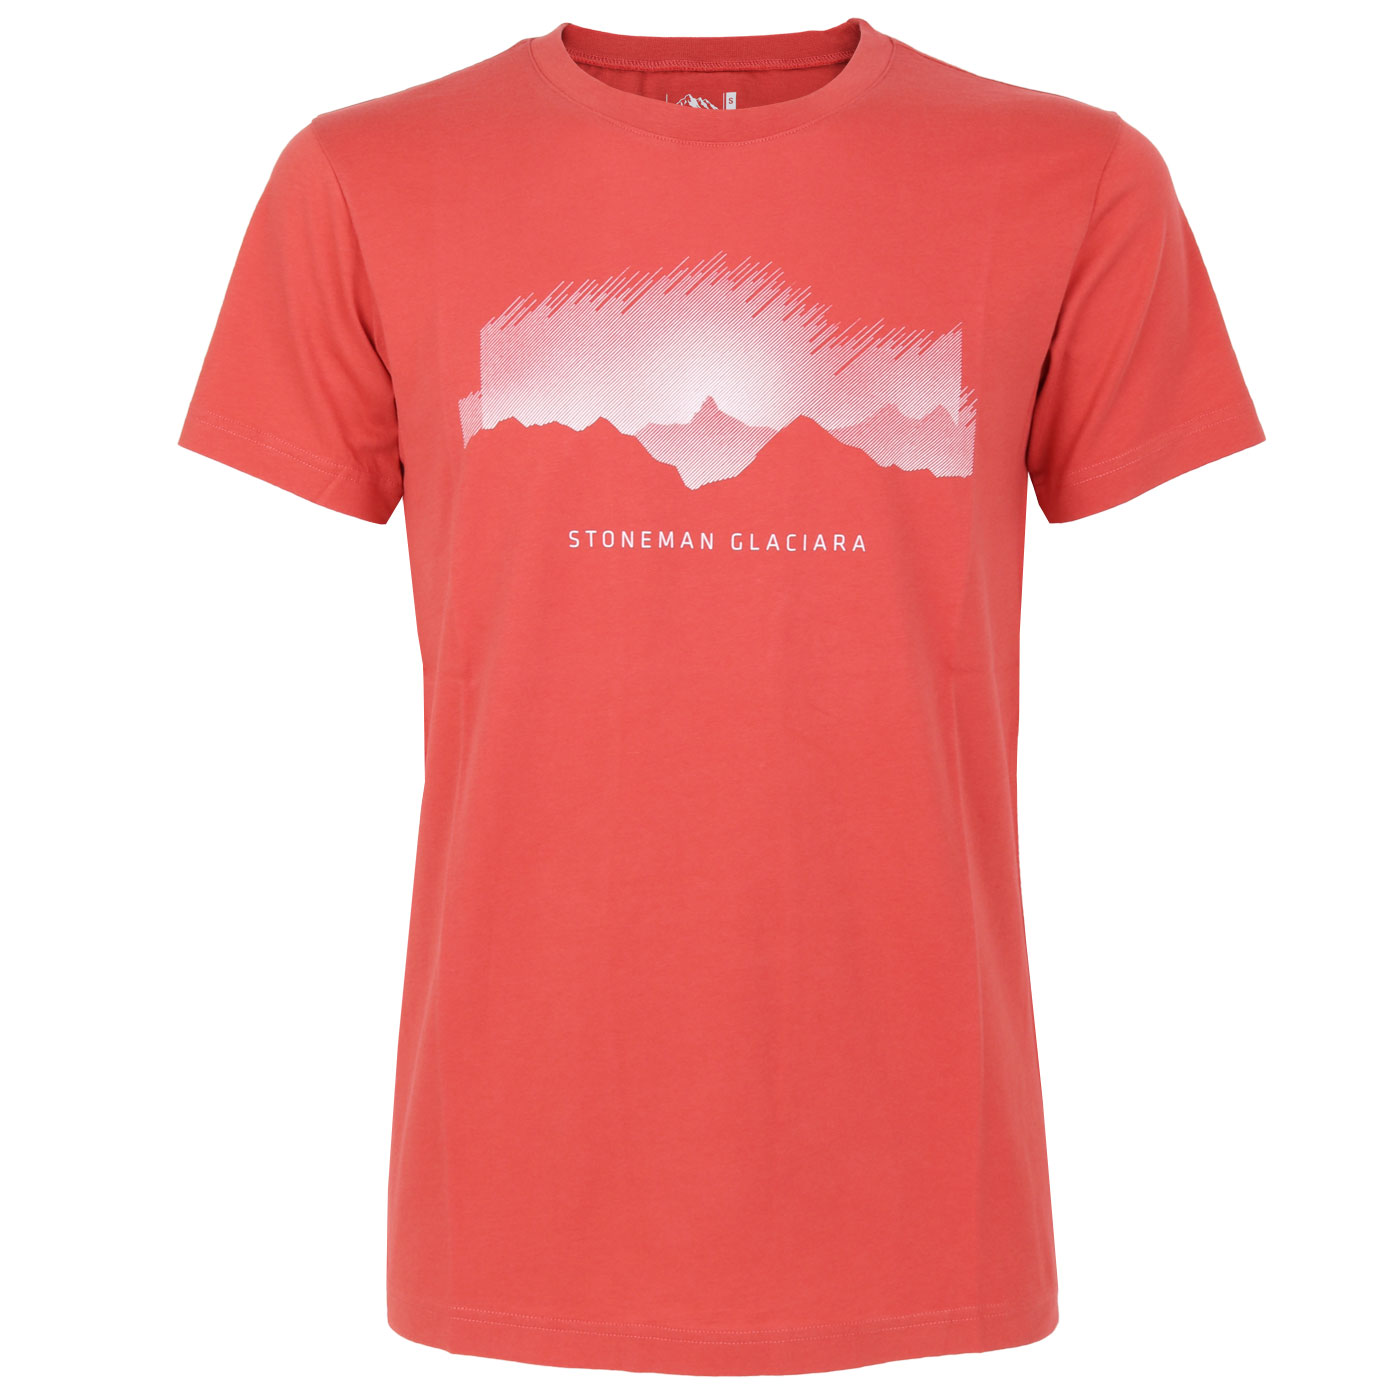 Stoneman Glaciara »Gipfelsturm« Männer T-Shirt by Maloja - vintage red